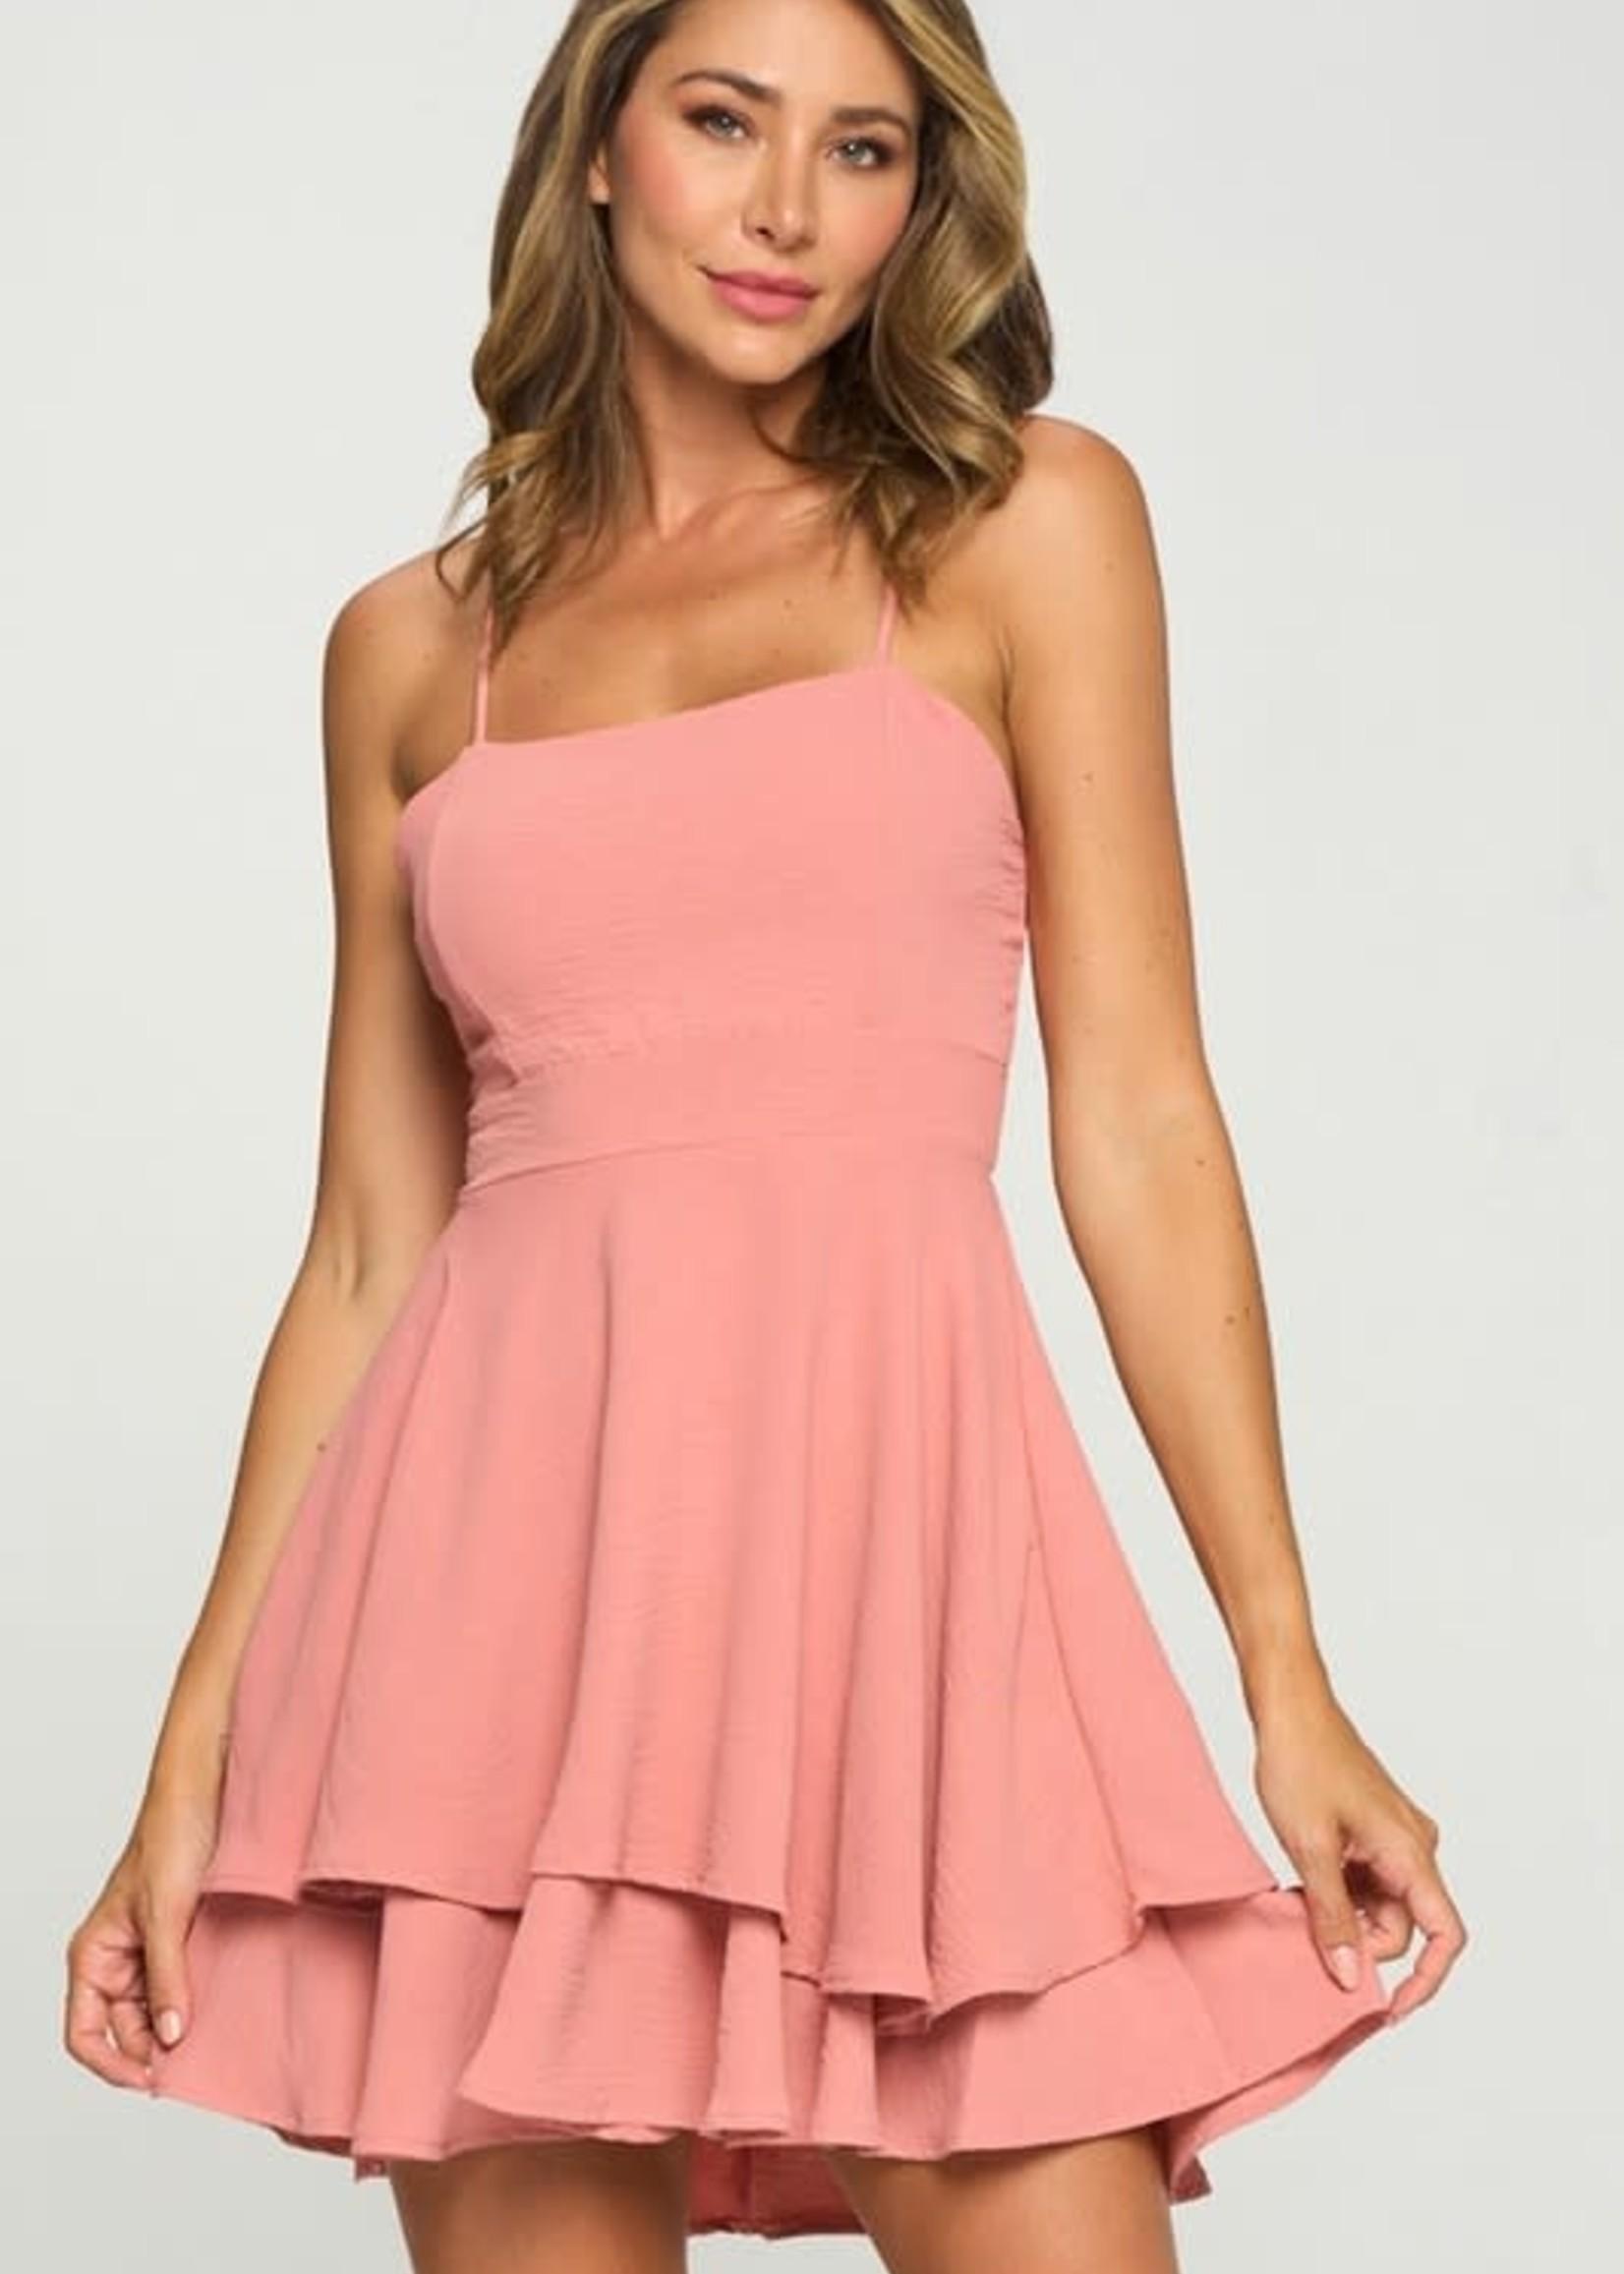 Best Occassion Blush Dress